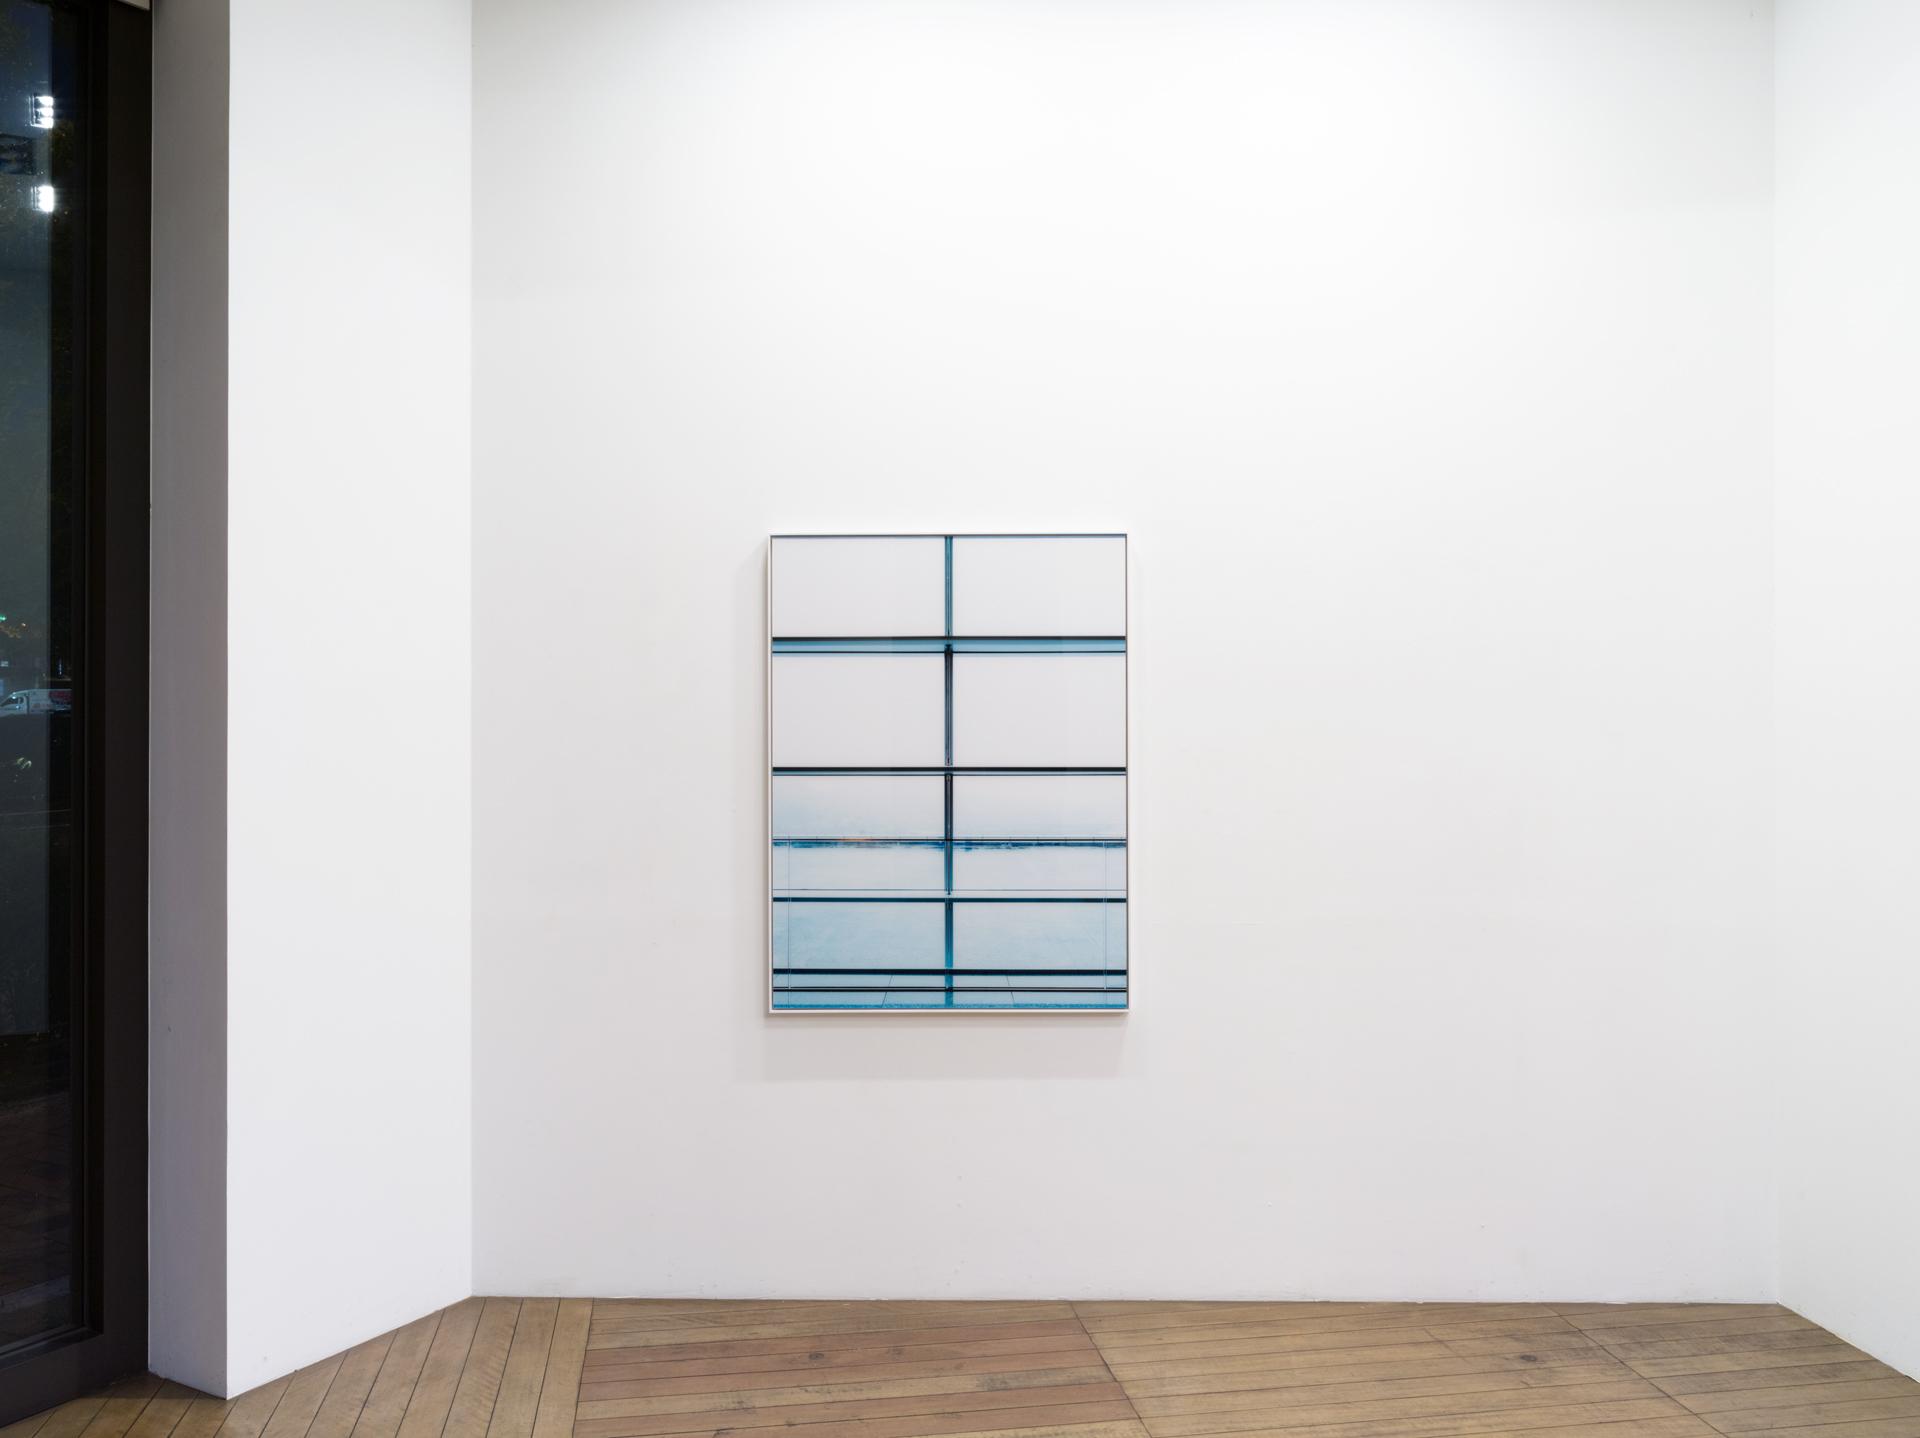 2016, Bundo Gallery 08